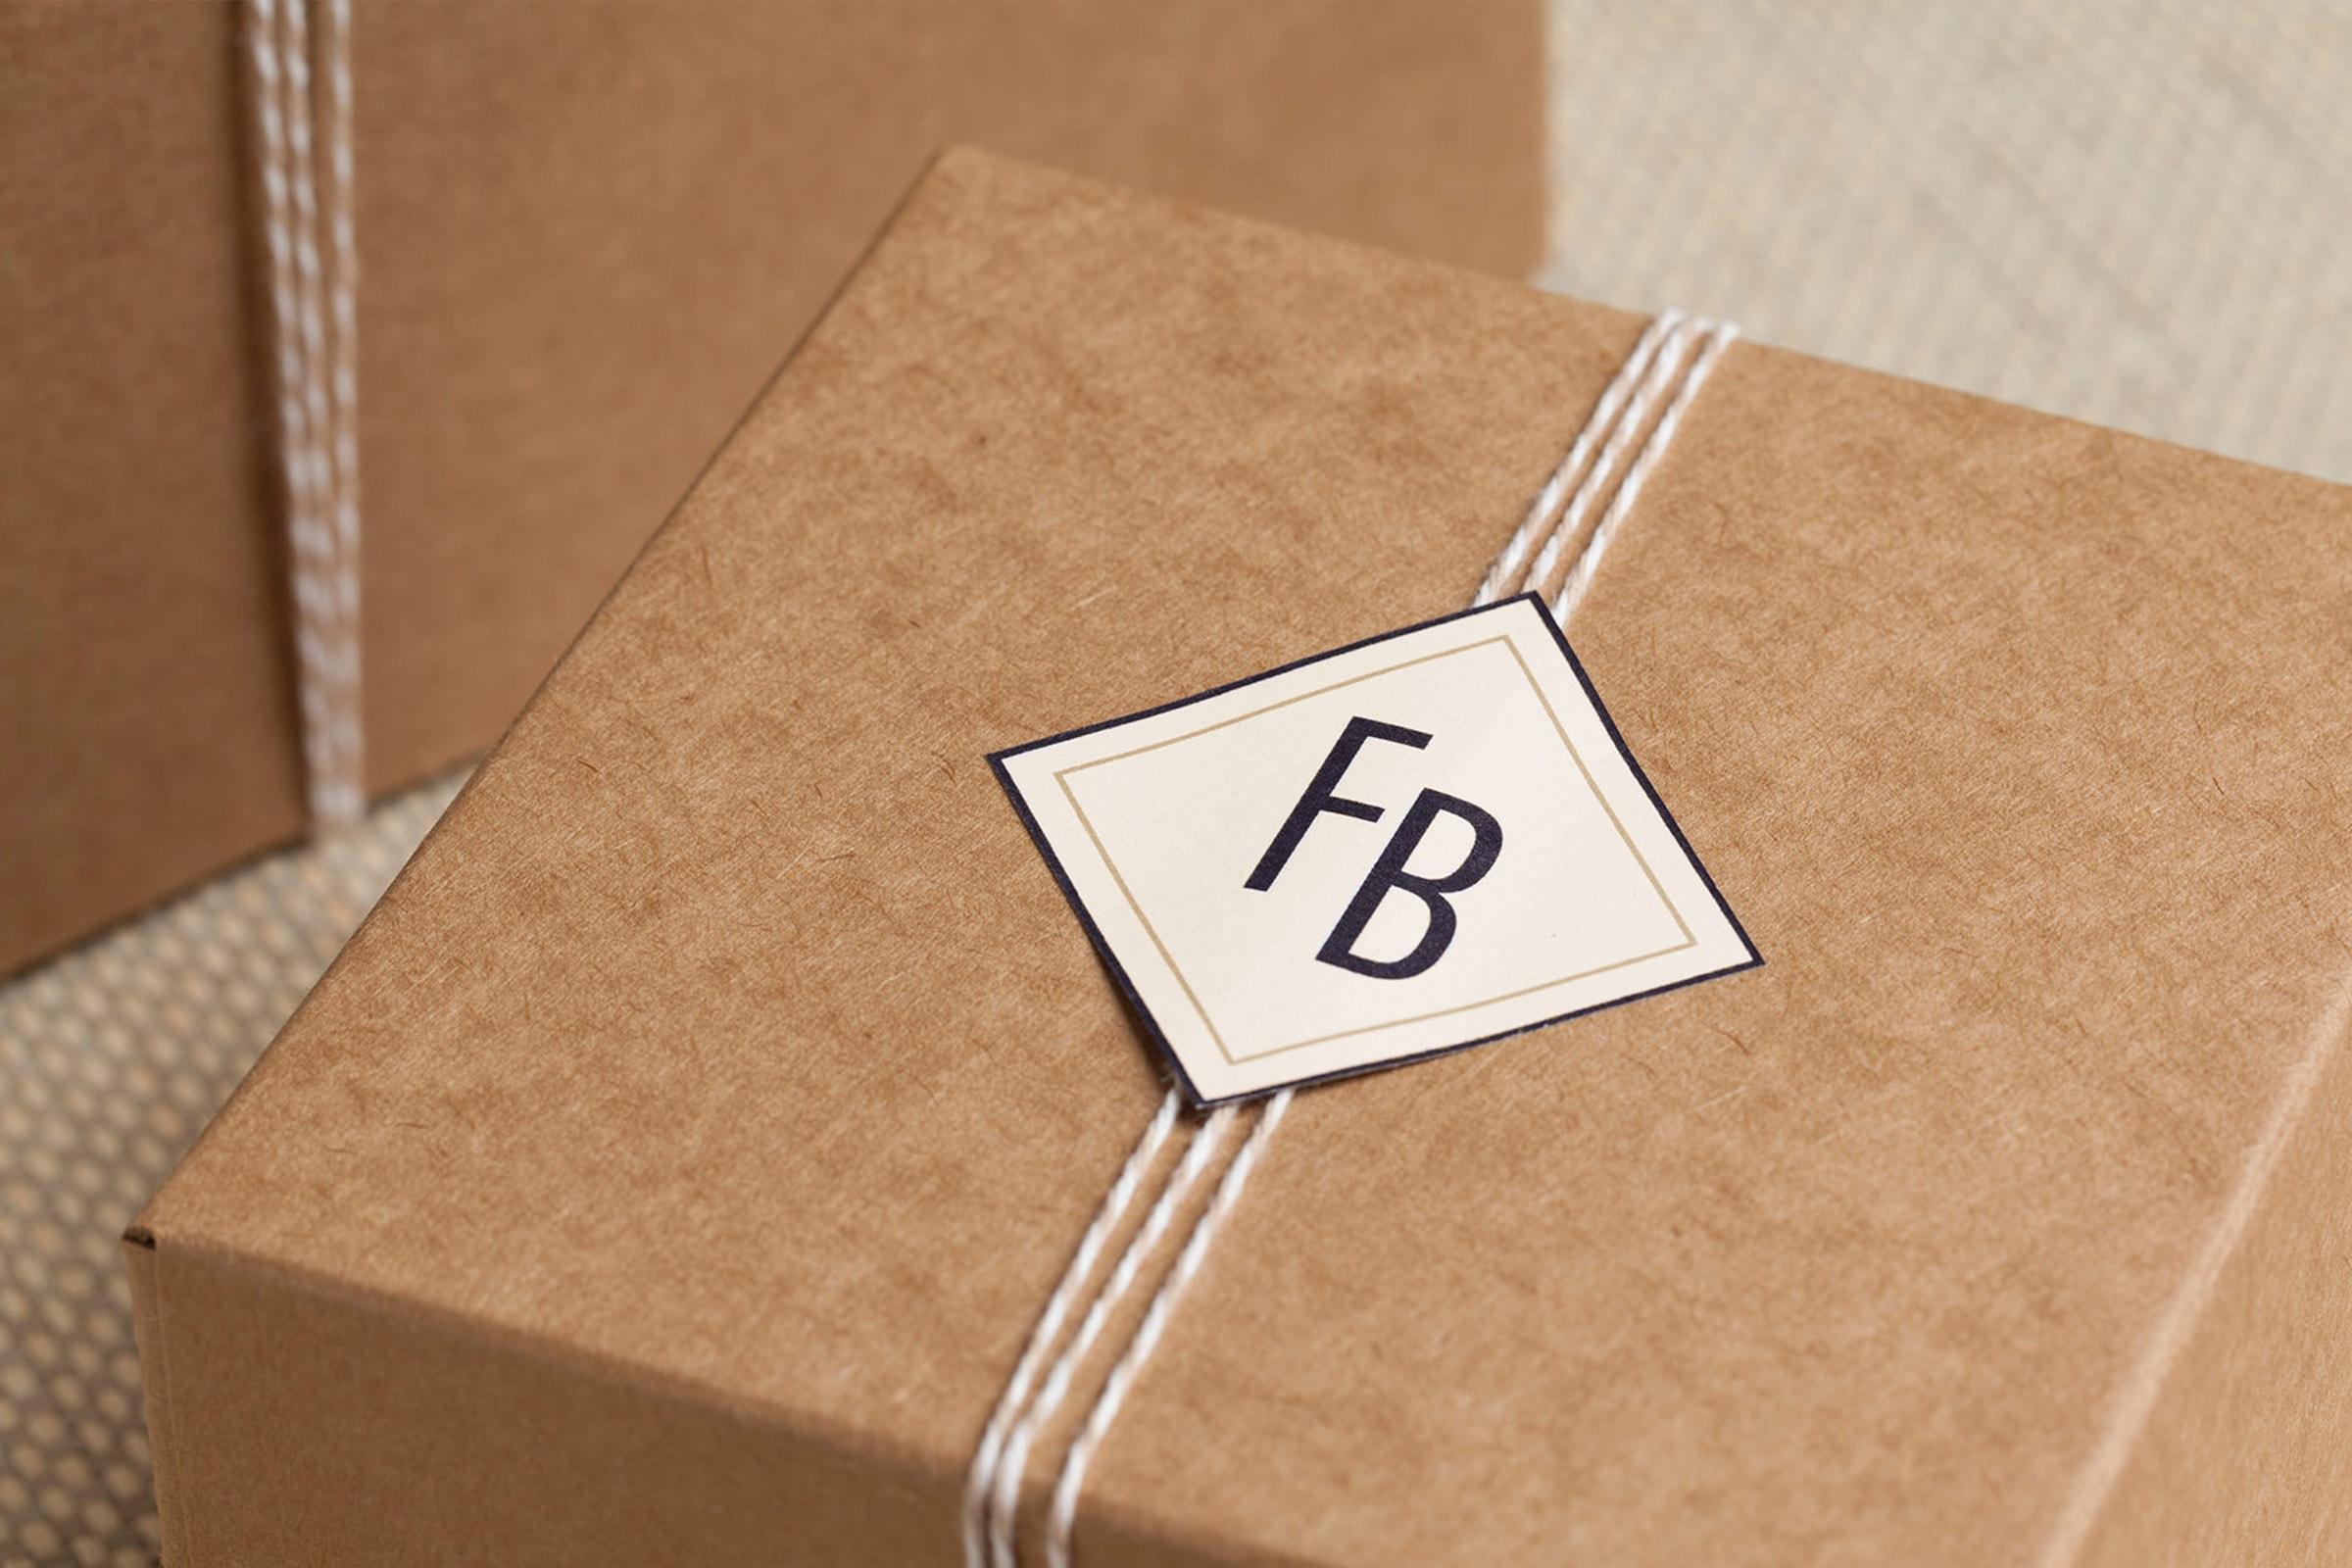 Cafè Ferdinand, Vodafone, Hamburg, Jungfernstieg, Packaging, Restaurant Branding, Box